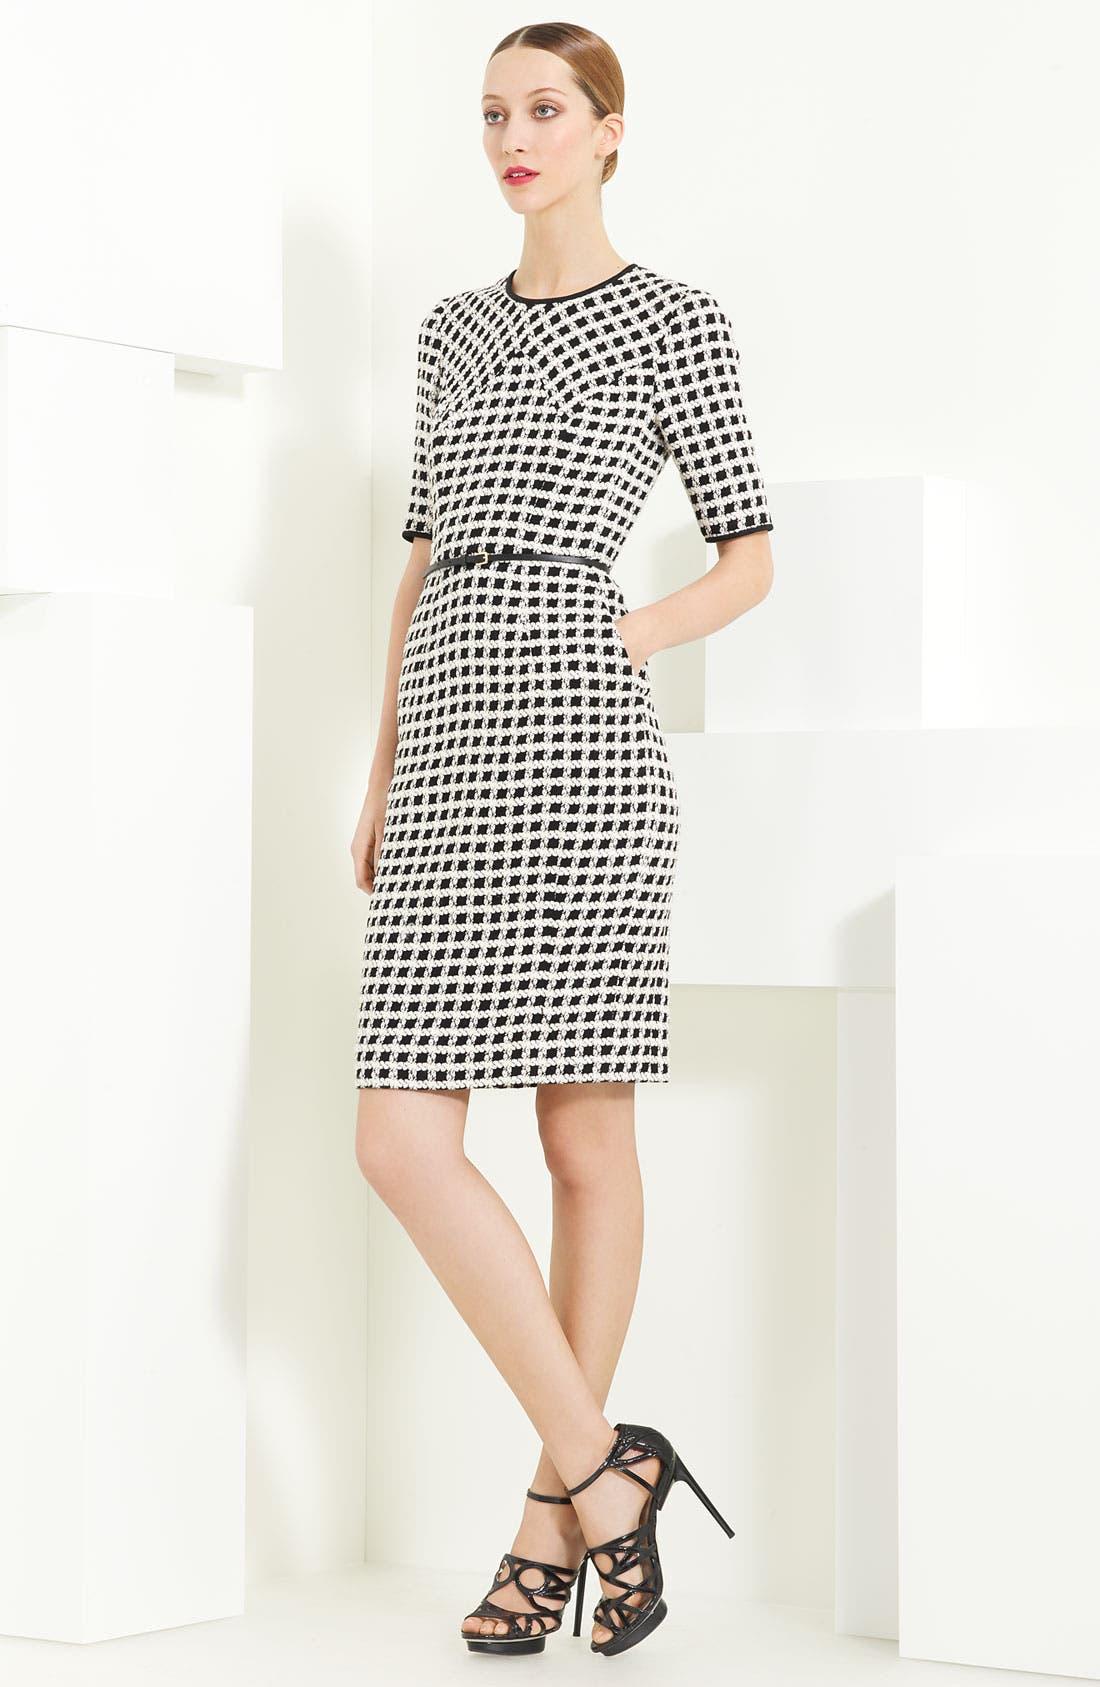 Alternate Image 1 Selected - Jason Wu Belted Tweed Dress